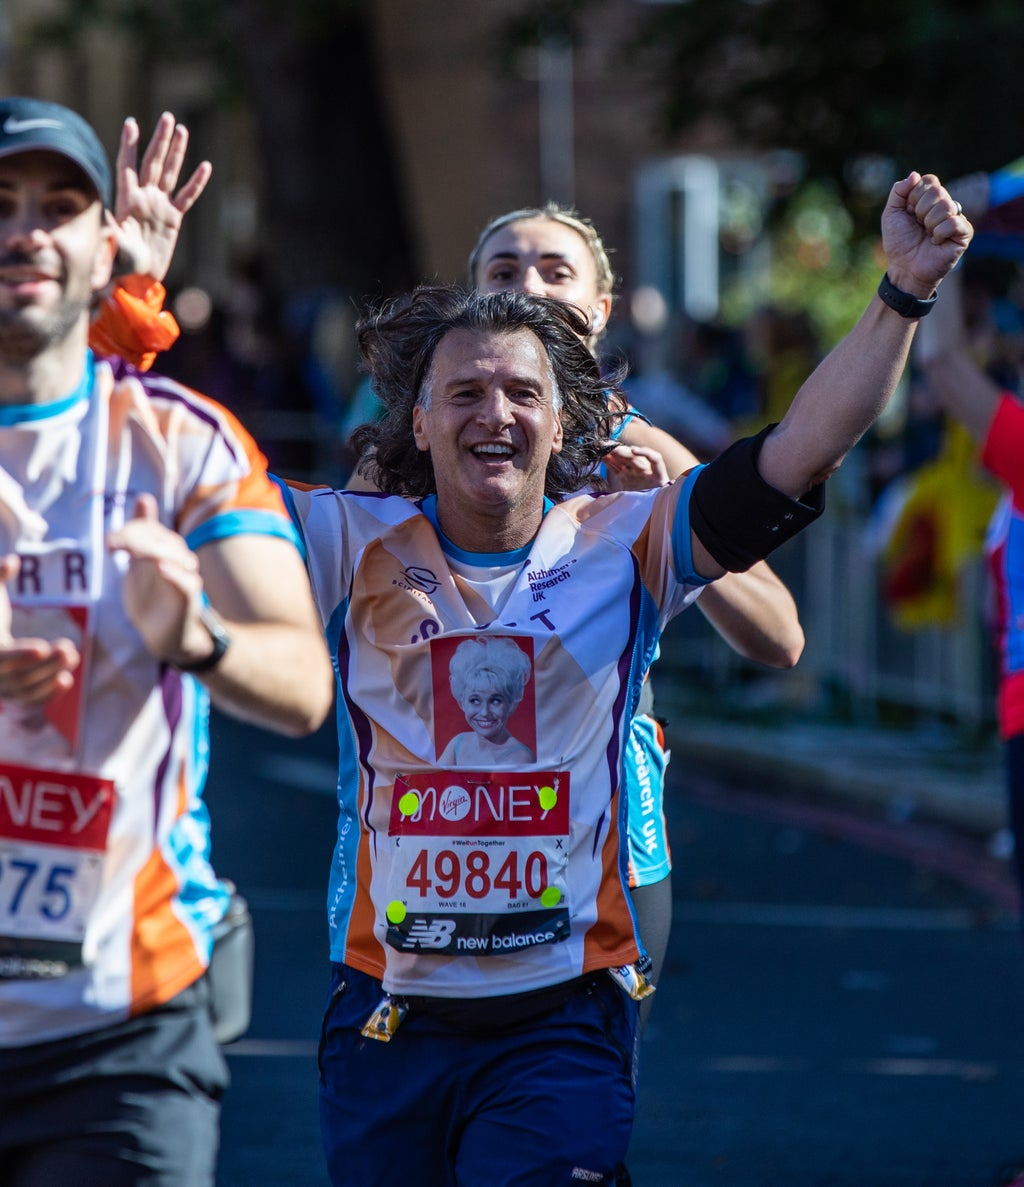 Scott Mitchell runs London Marathon wearing tribute to late wife Barbara Windsor